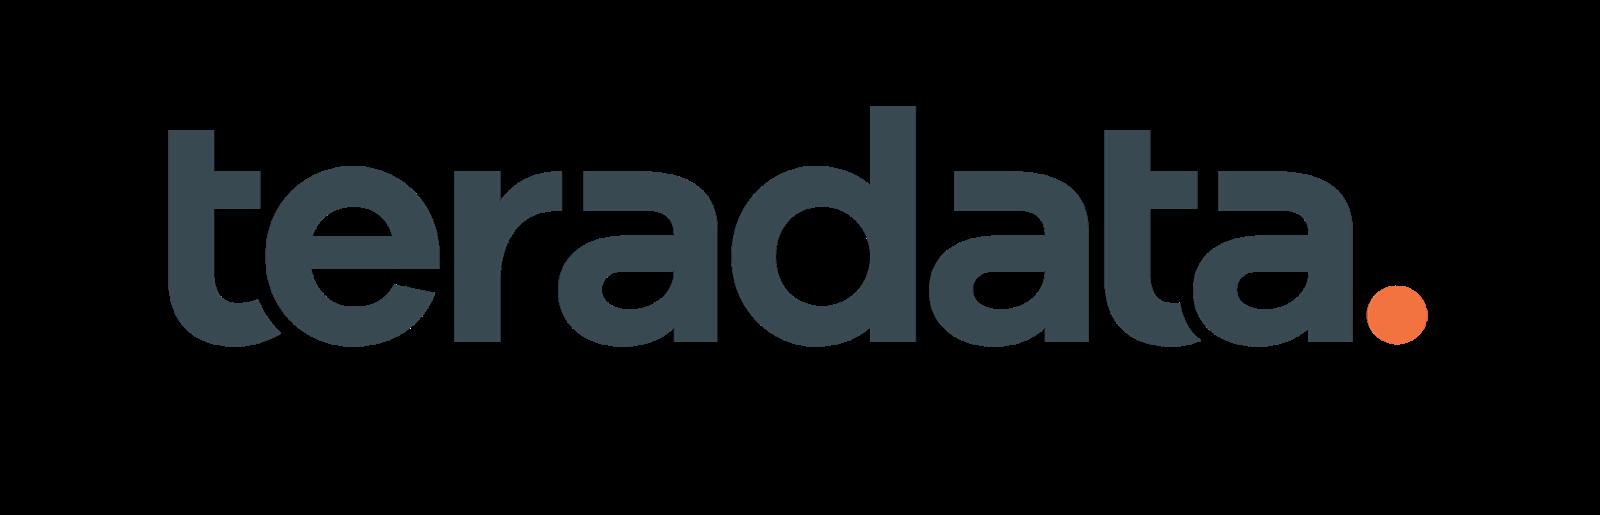 Difference Between Hadoop and Teradata